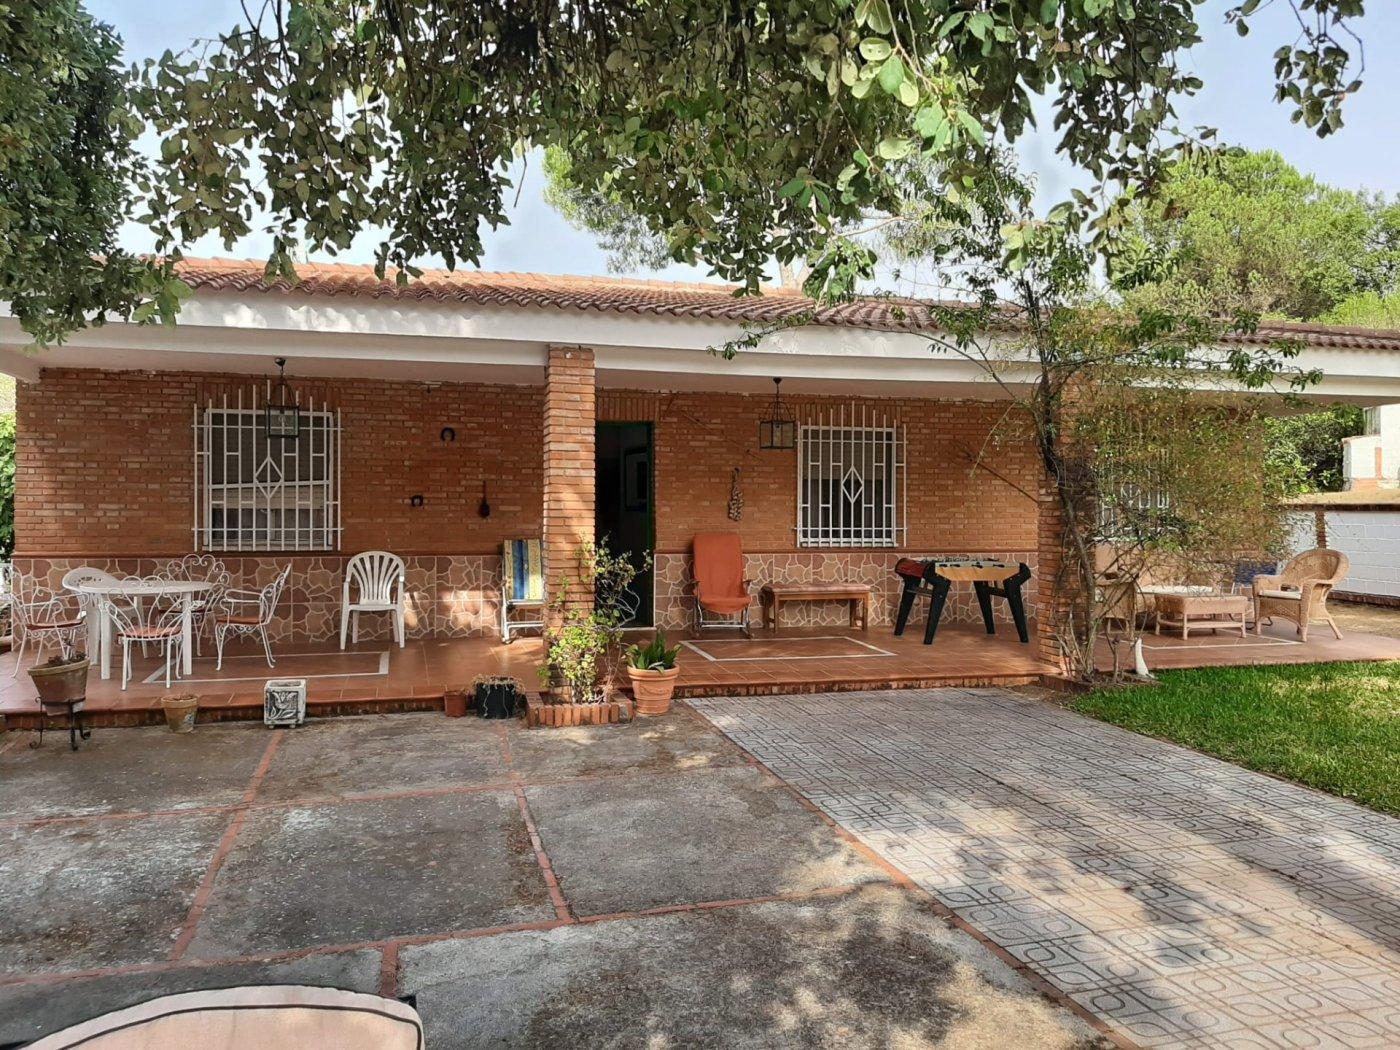 Estupenda casa con piscina propia en zona de assuan- las jaras-cÓrdoba. - imagenInmueble1